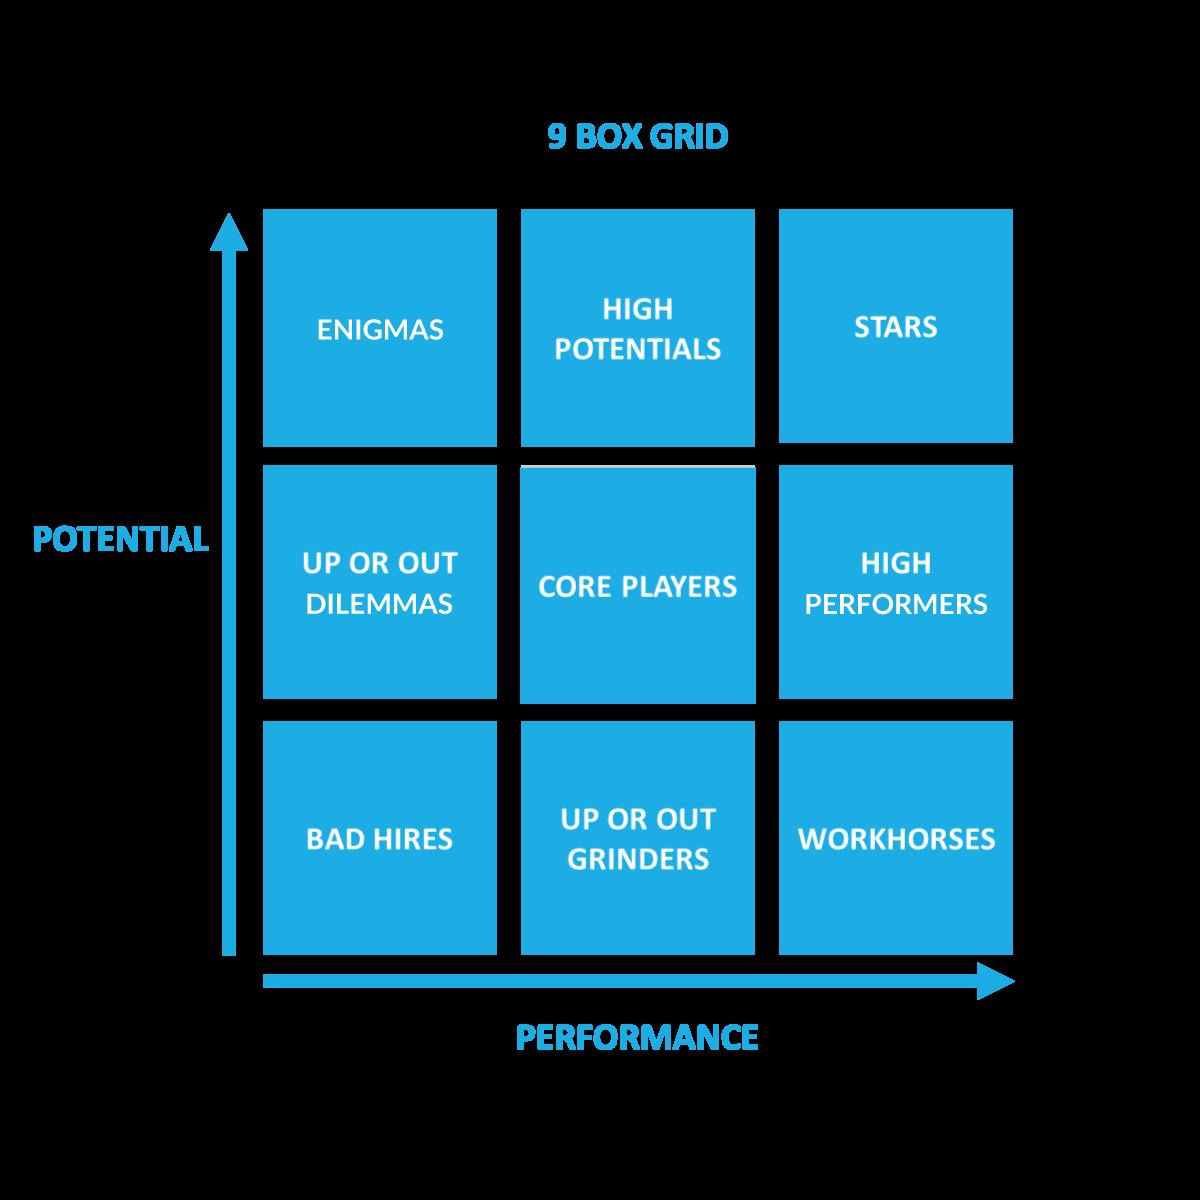 9 Box Grid for Leadership Development Plan